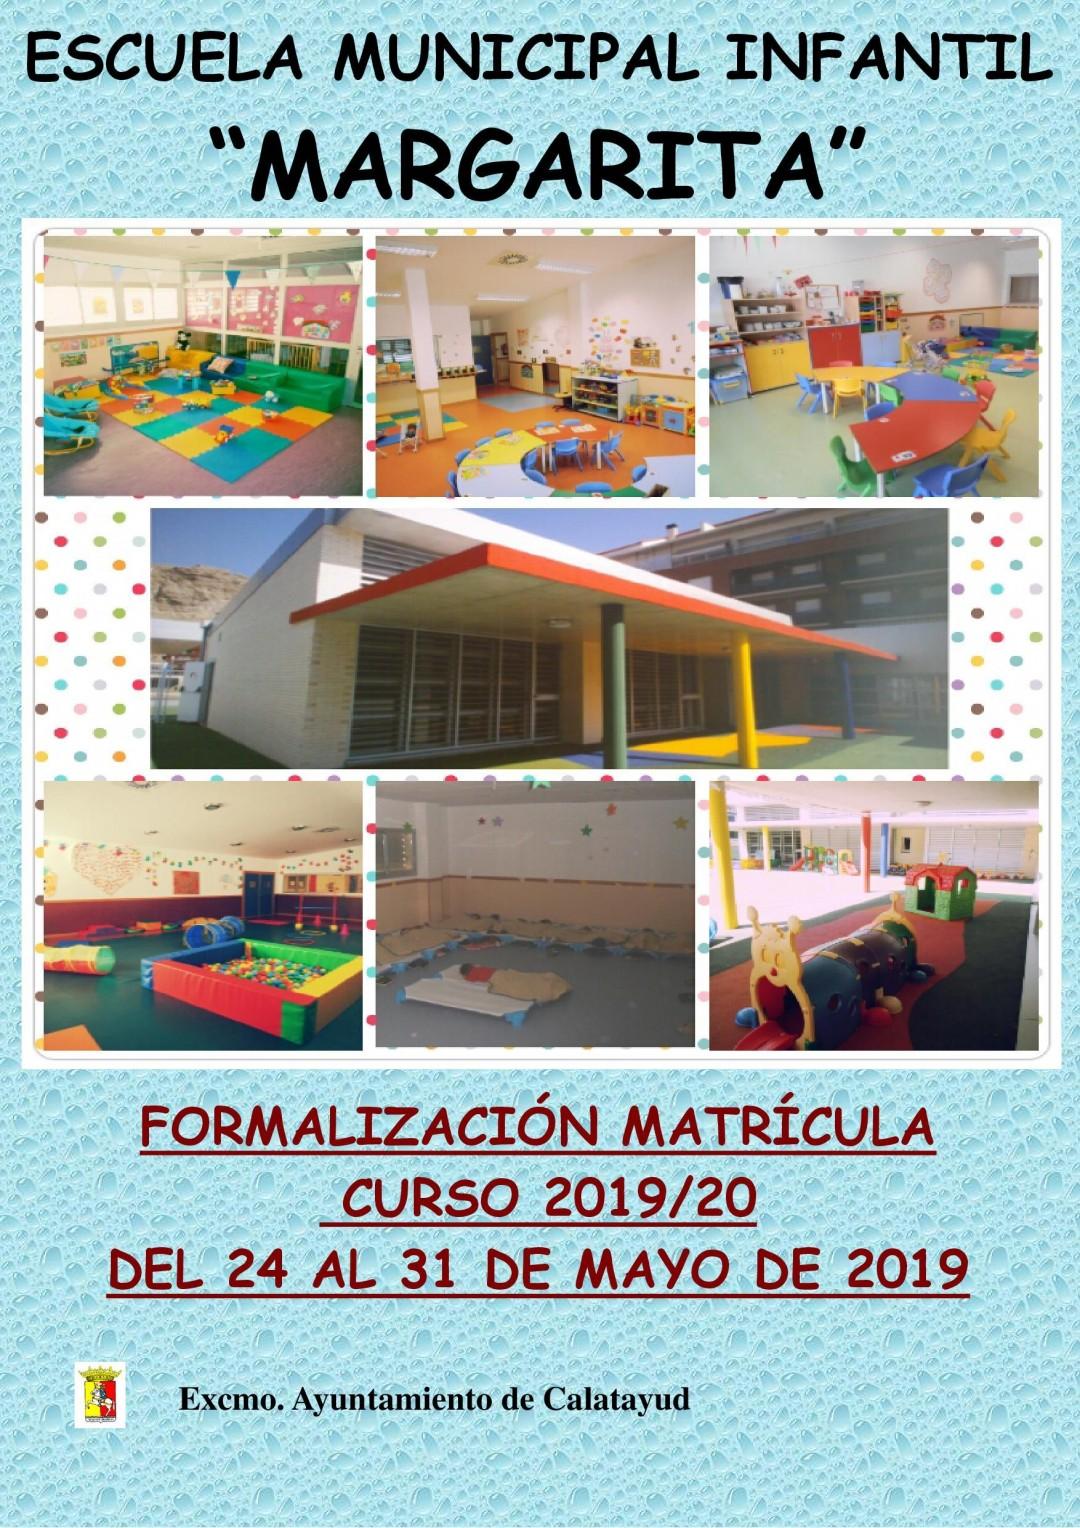 formalización matrícula